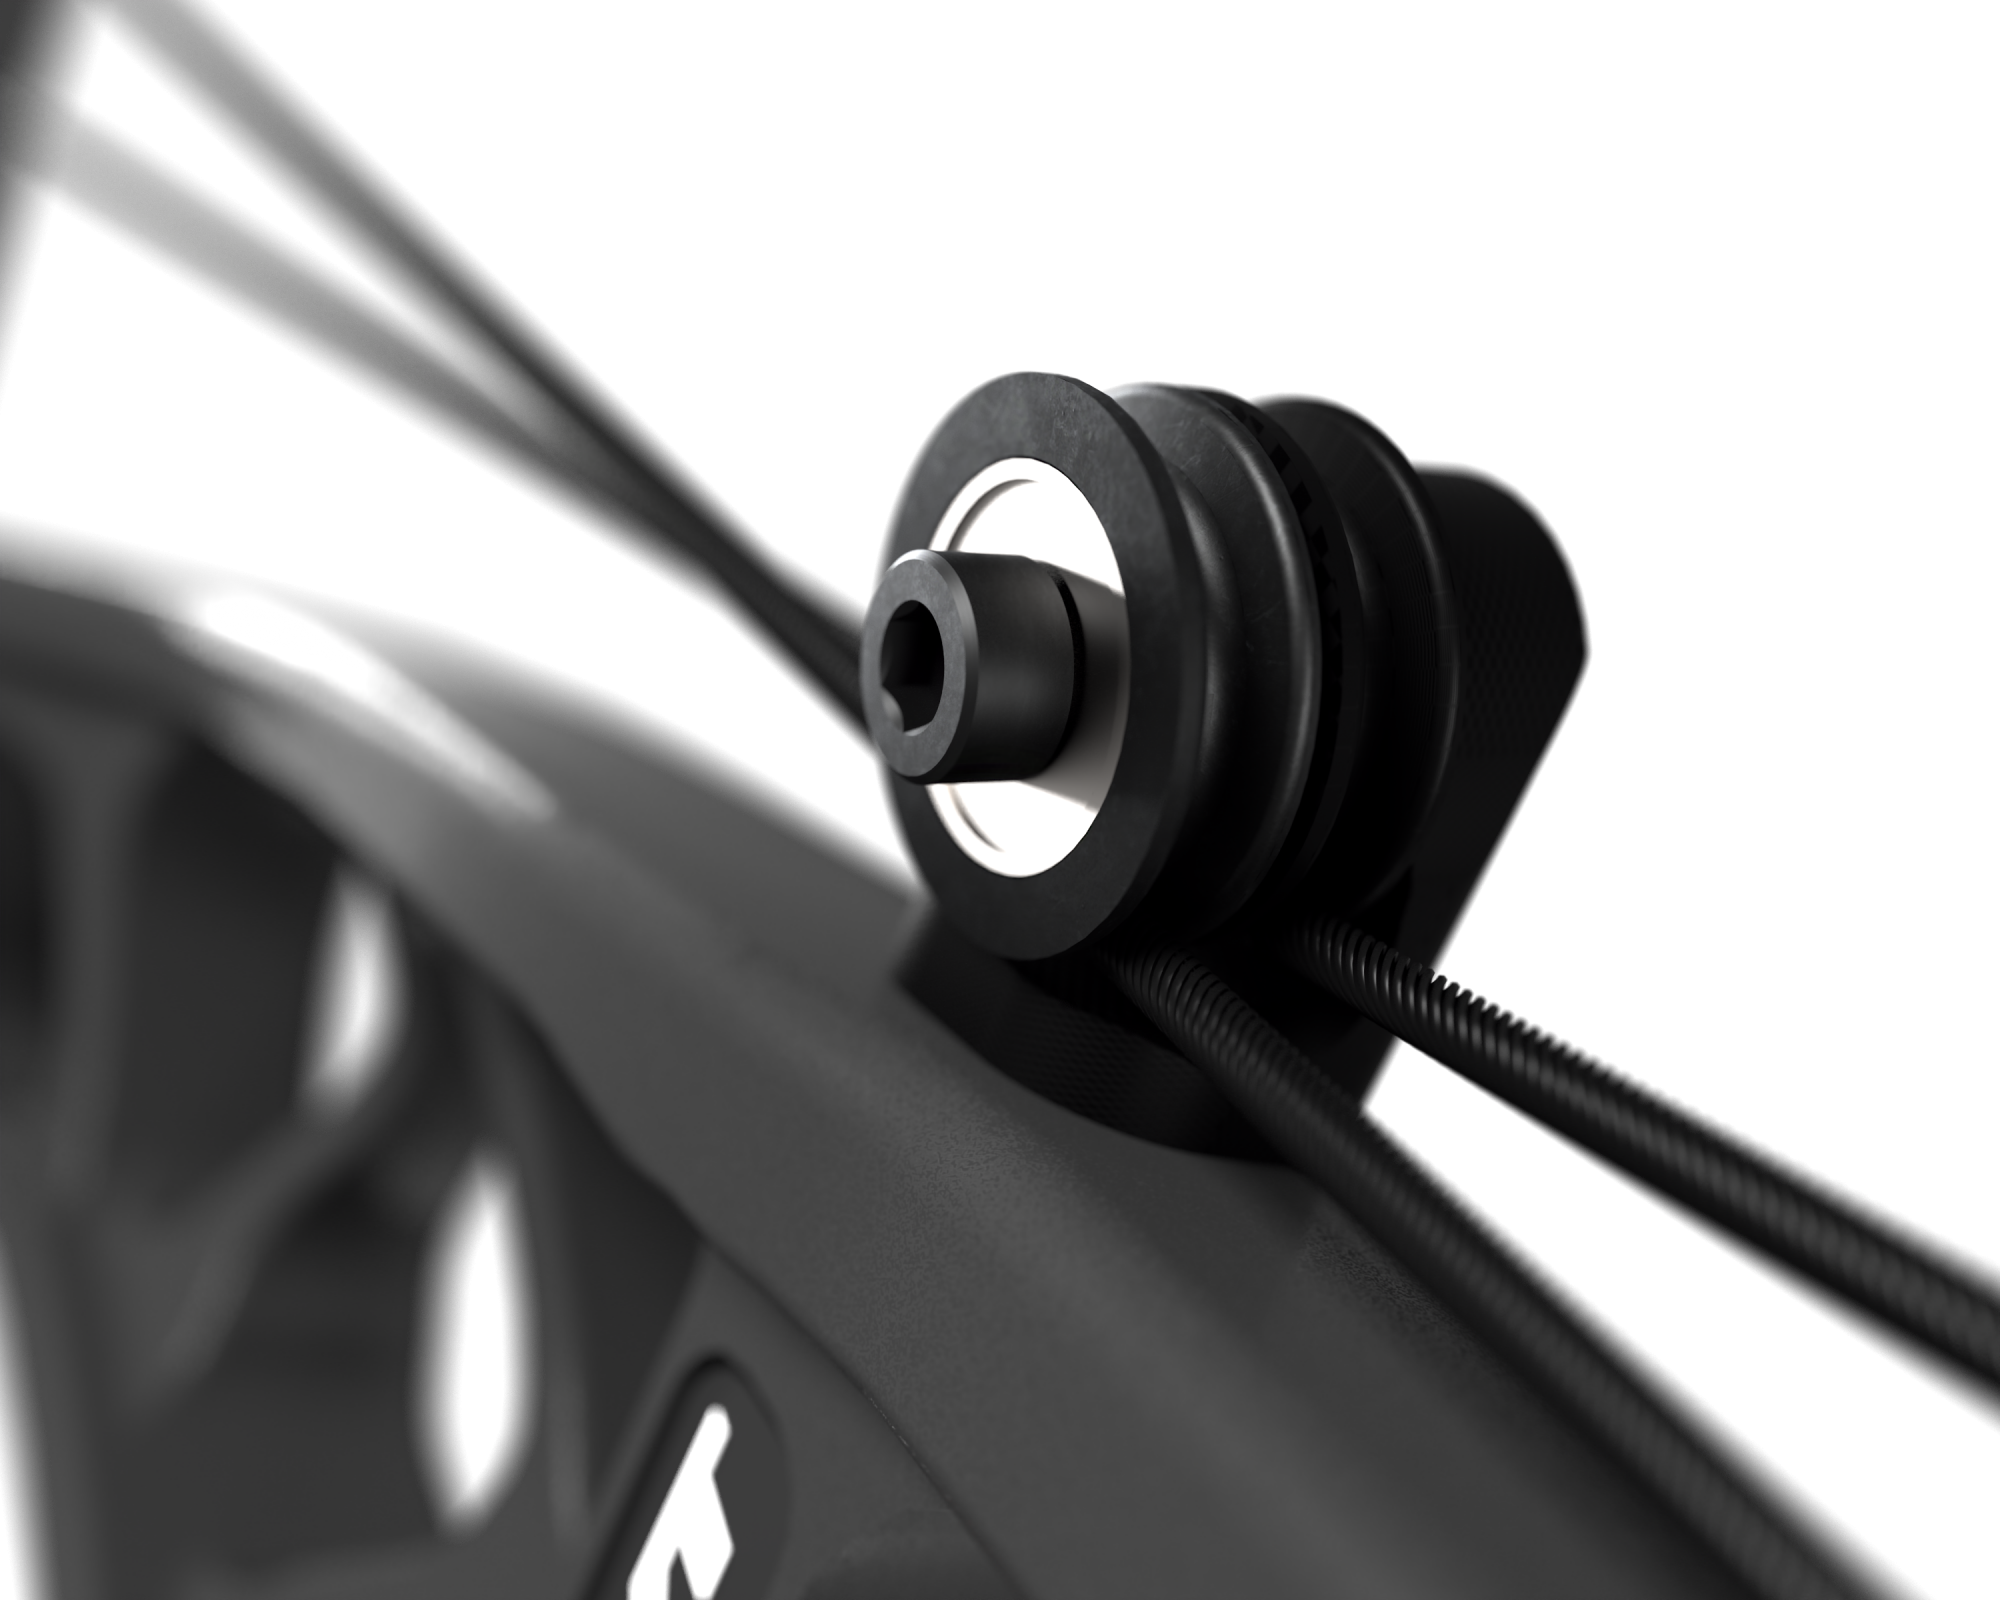 Torrex XT Roller Cable Guard